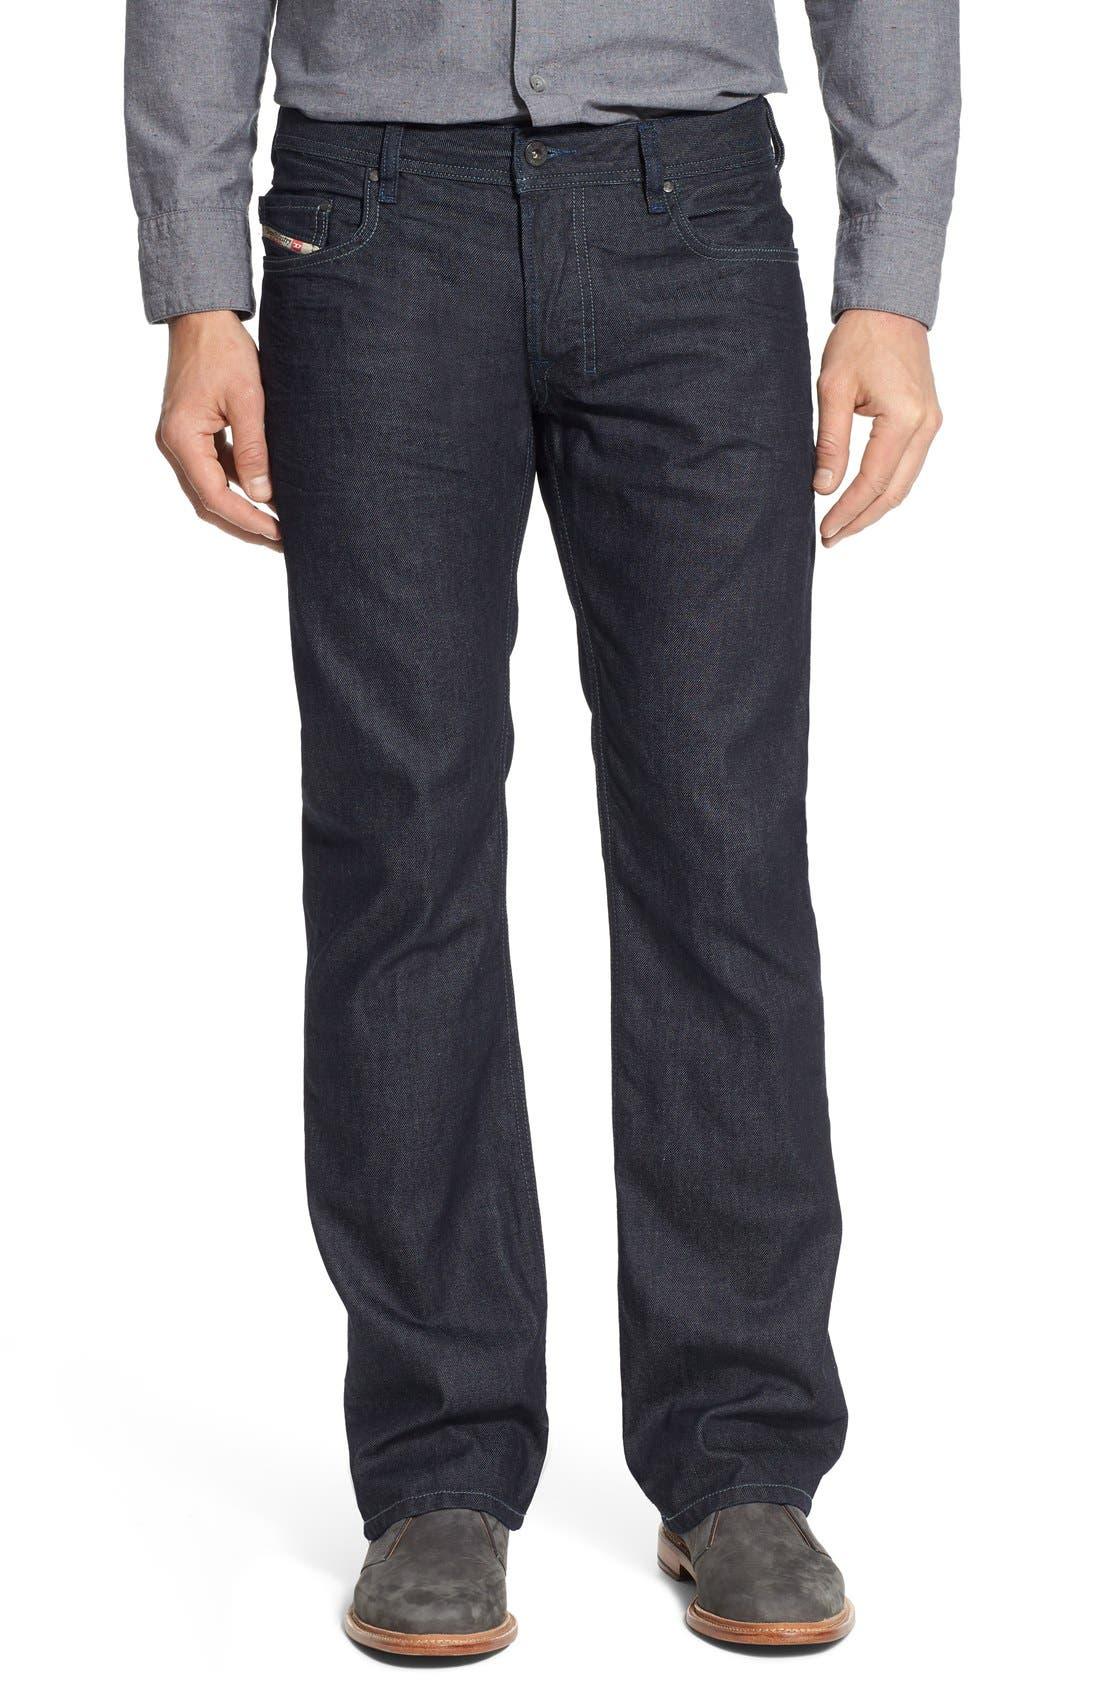 Zatiny Bootcut Jeans,                             Main thumbnail 1, color,                             THE BLUE BARON